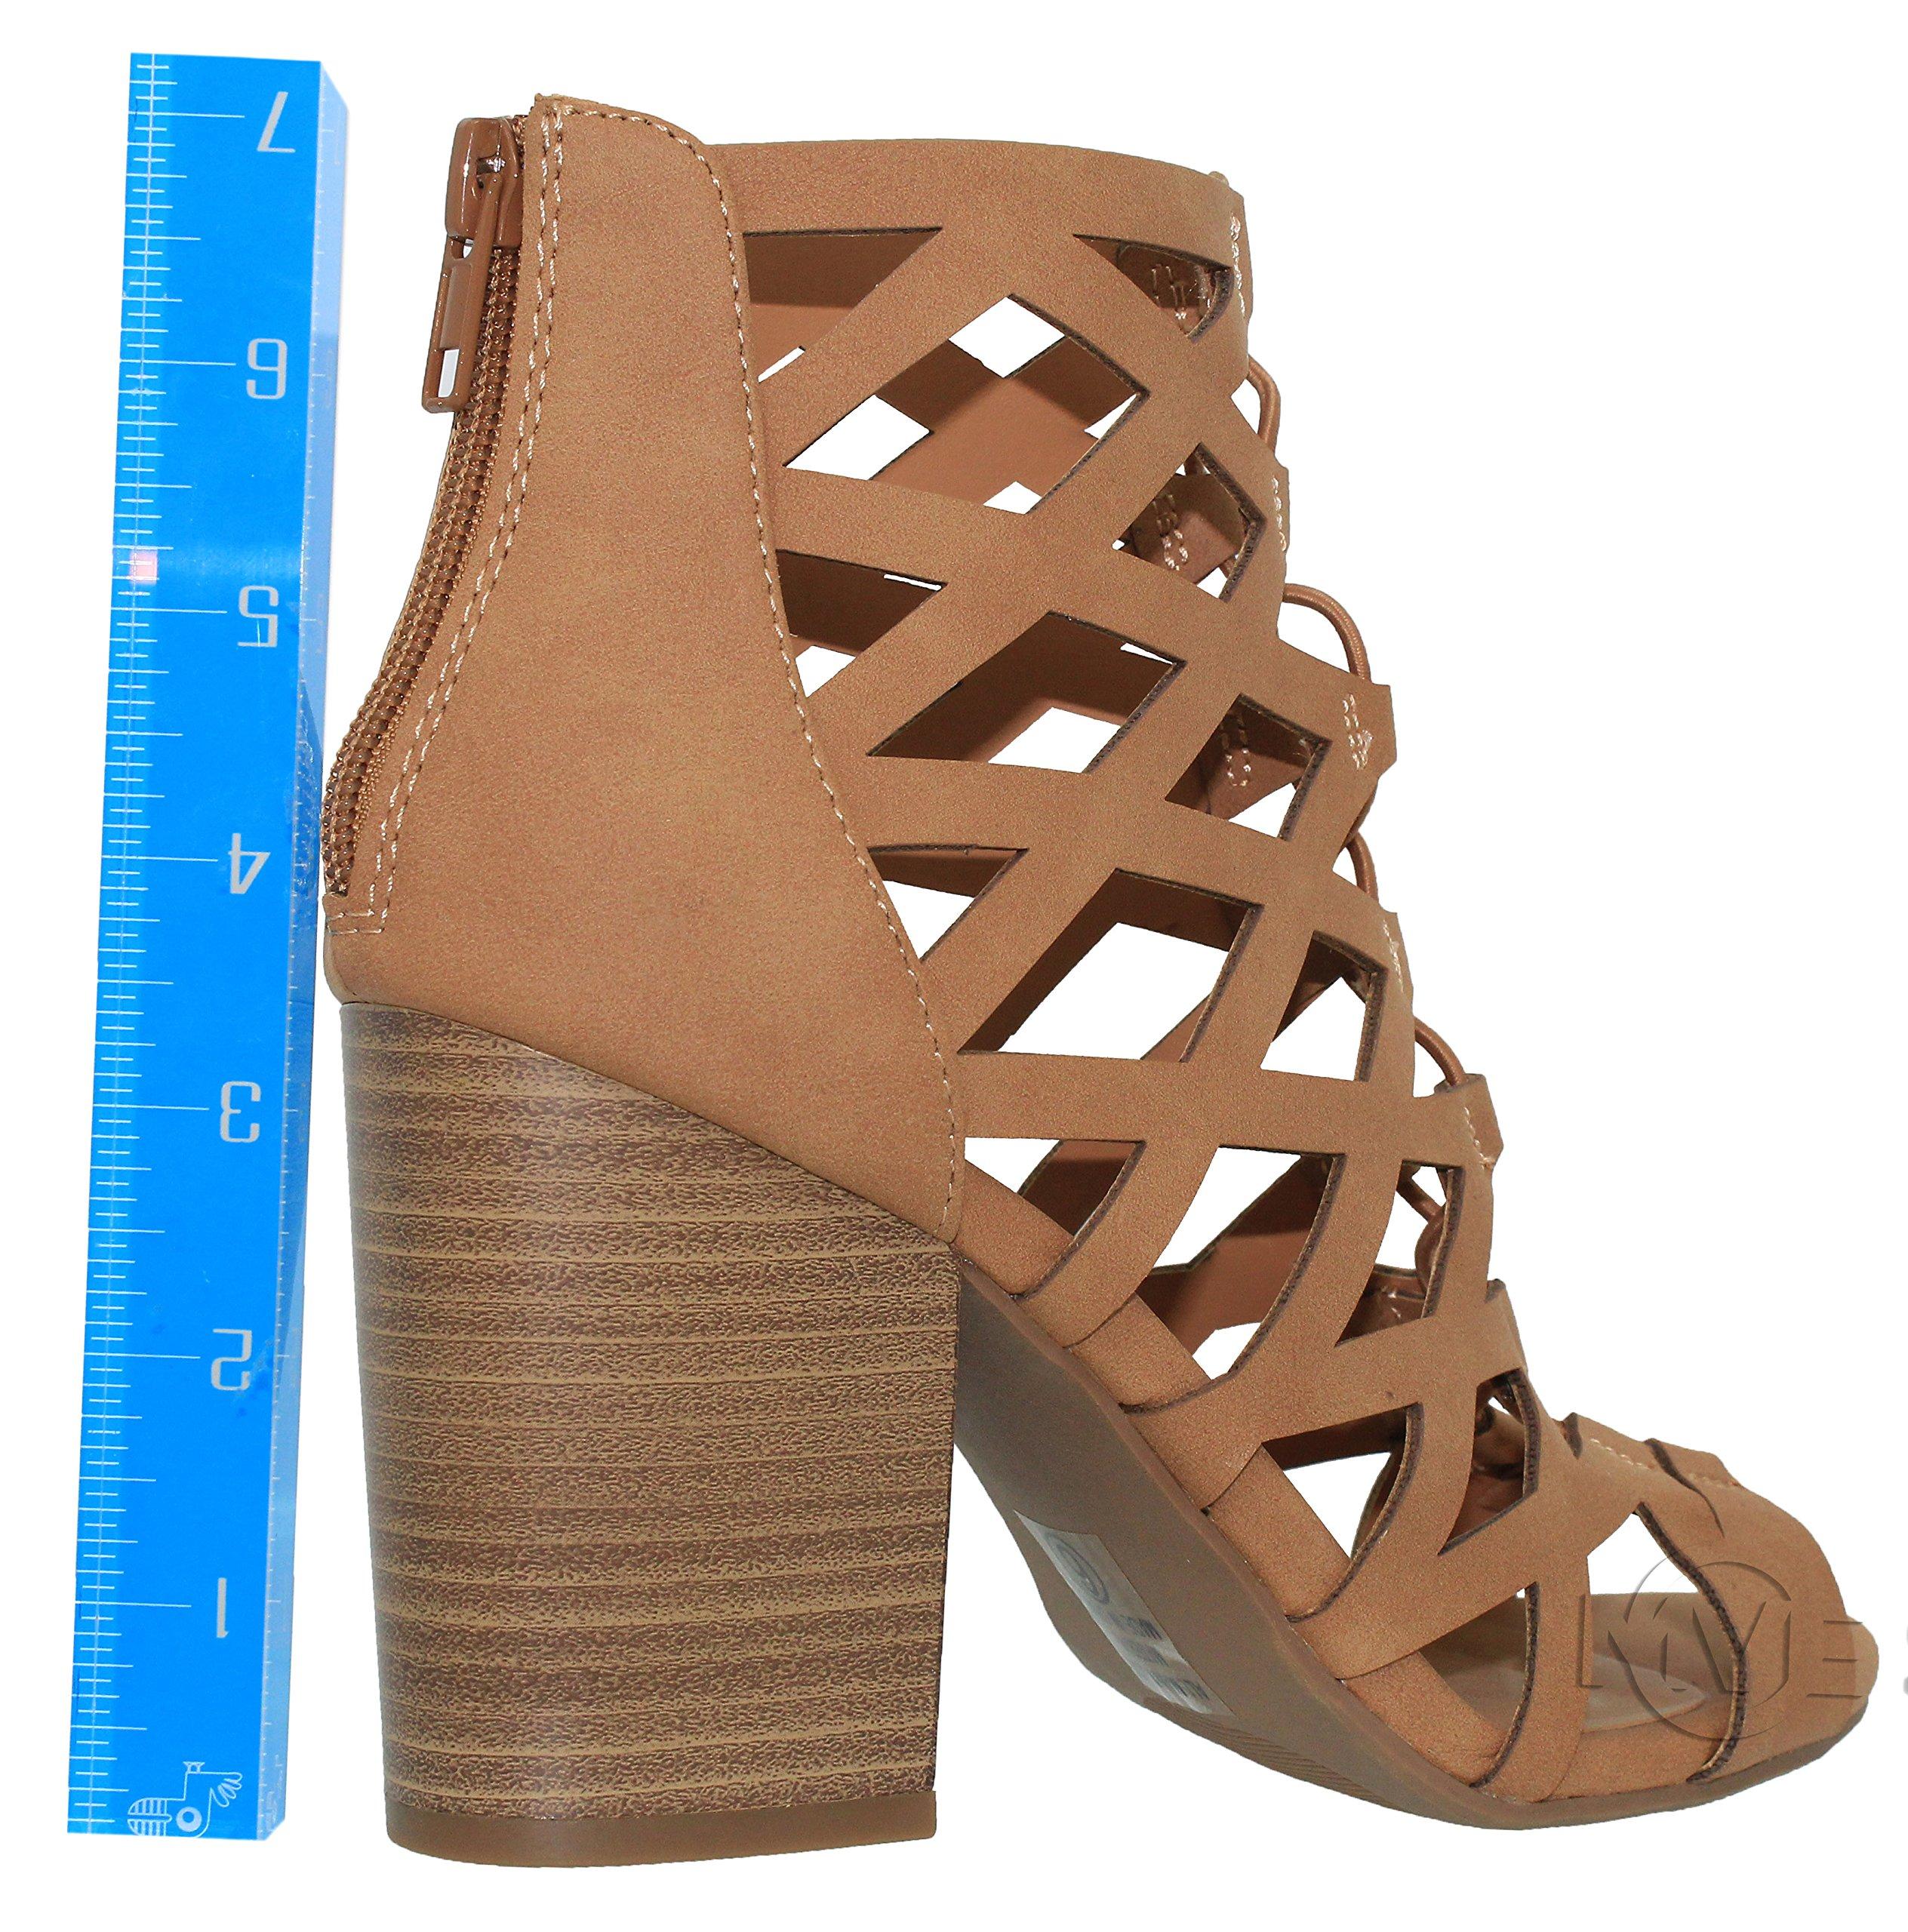 MVE Shoes Women's Open Toe Strappy Back Zipper Chunky Heel, tan nb Size 10 by MVE Shoes (Image #2)